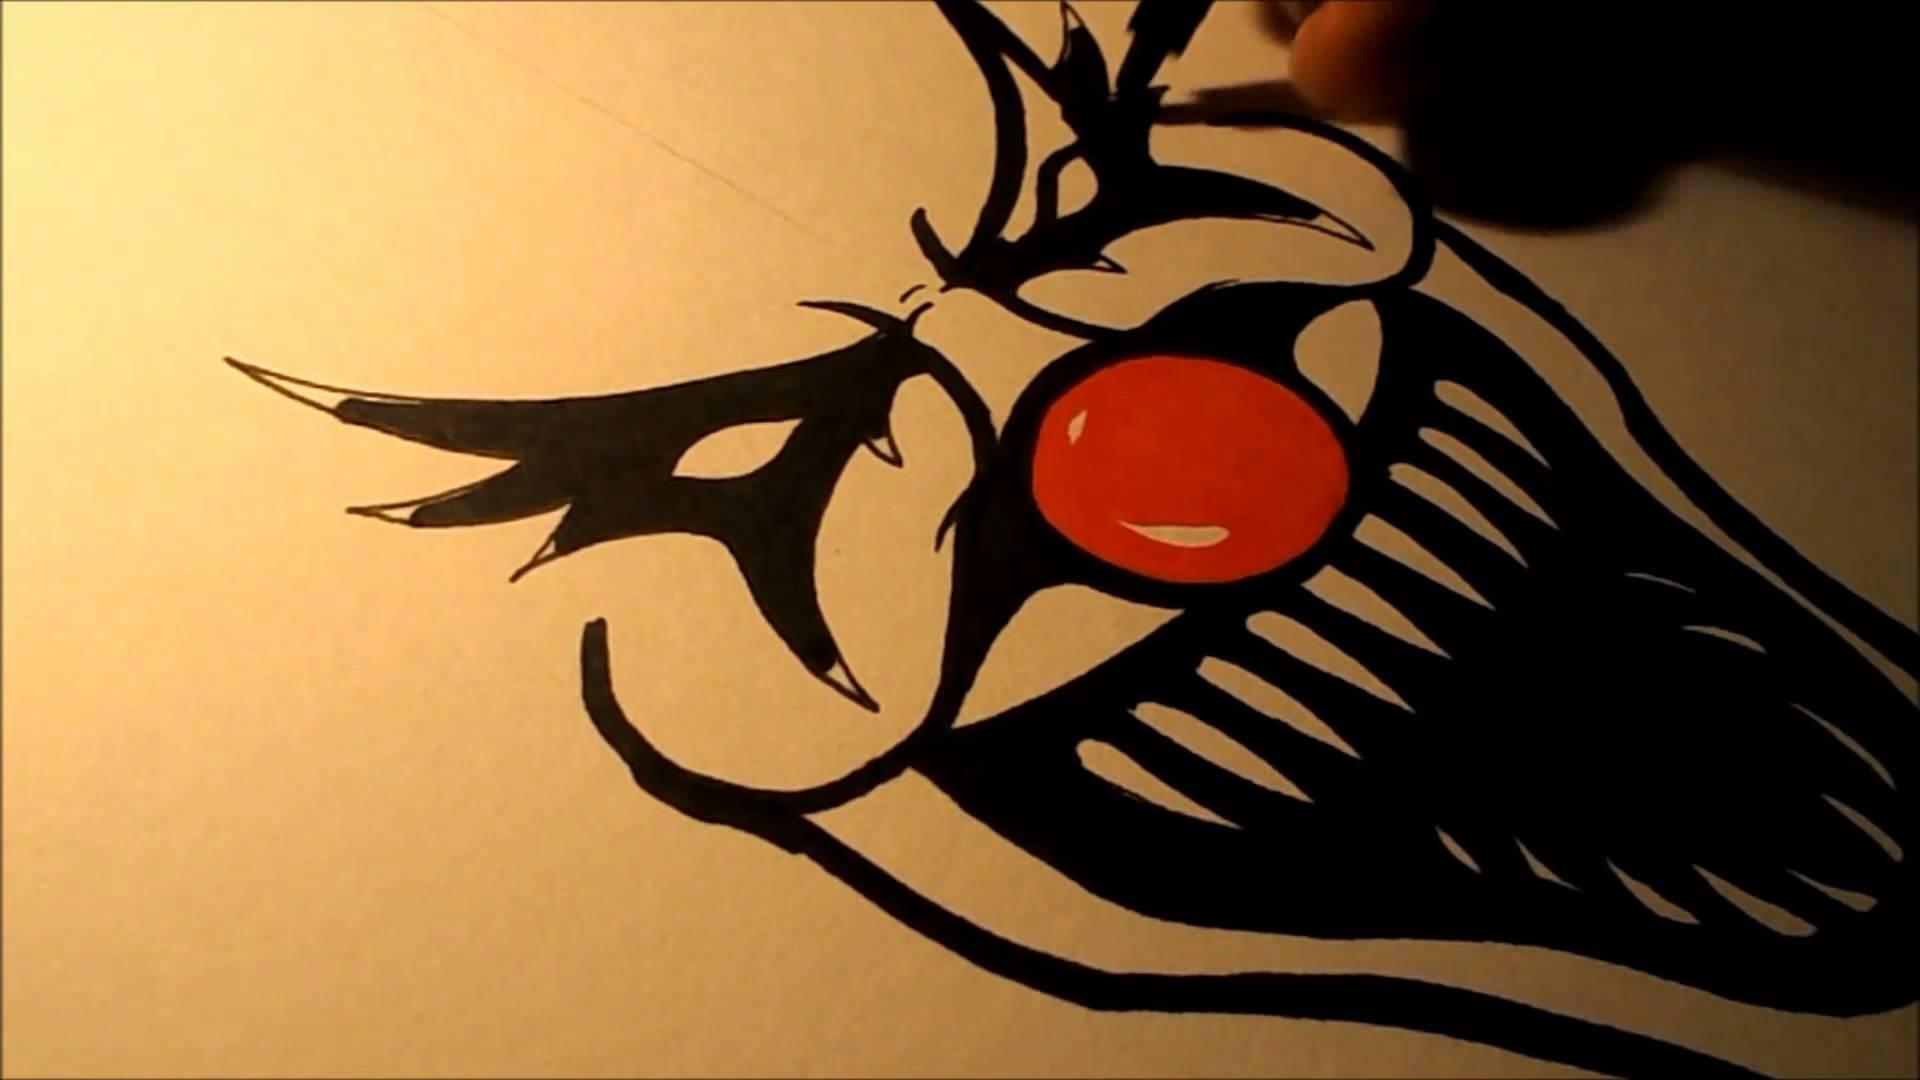 1920x1080 How To Draw An Evil Clown Ii